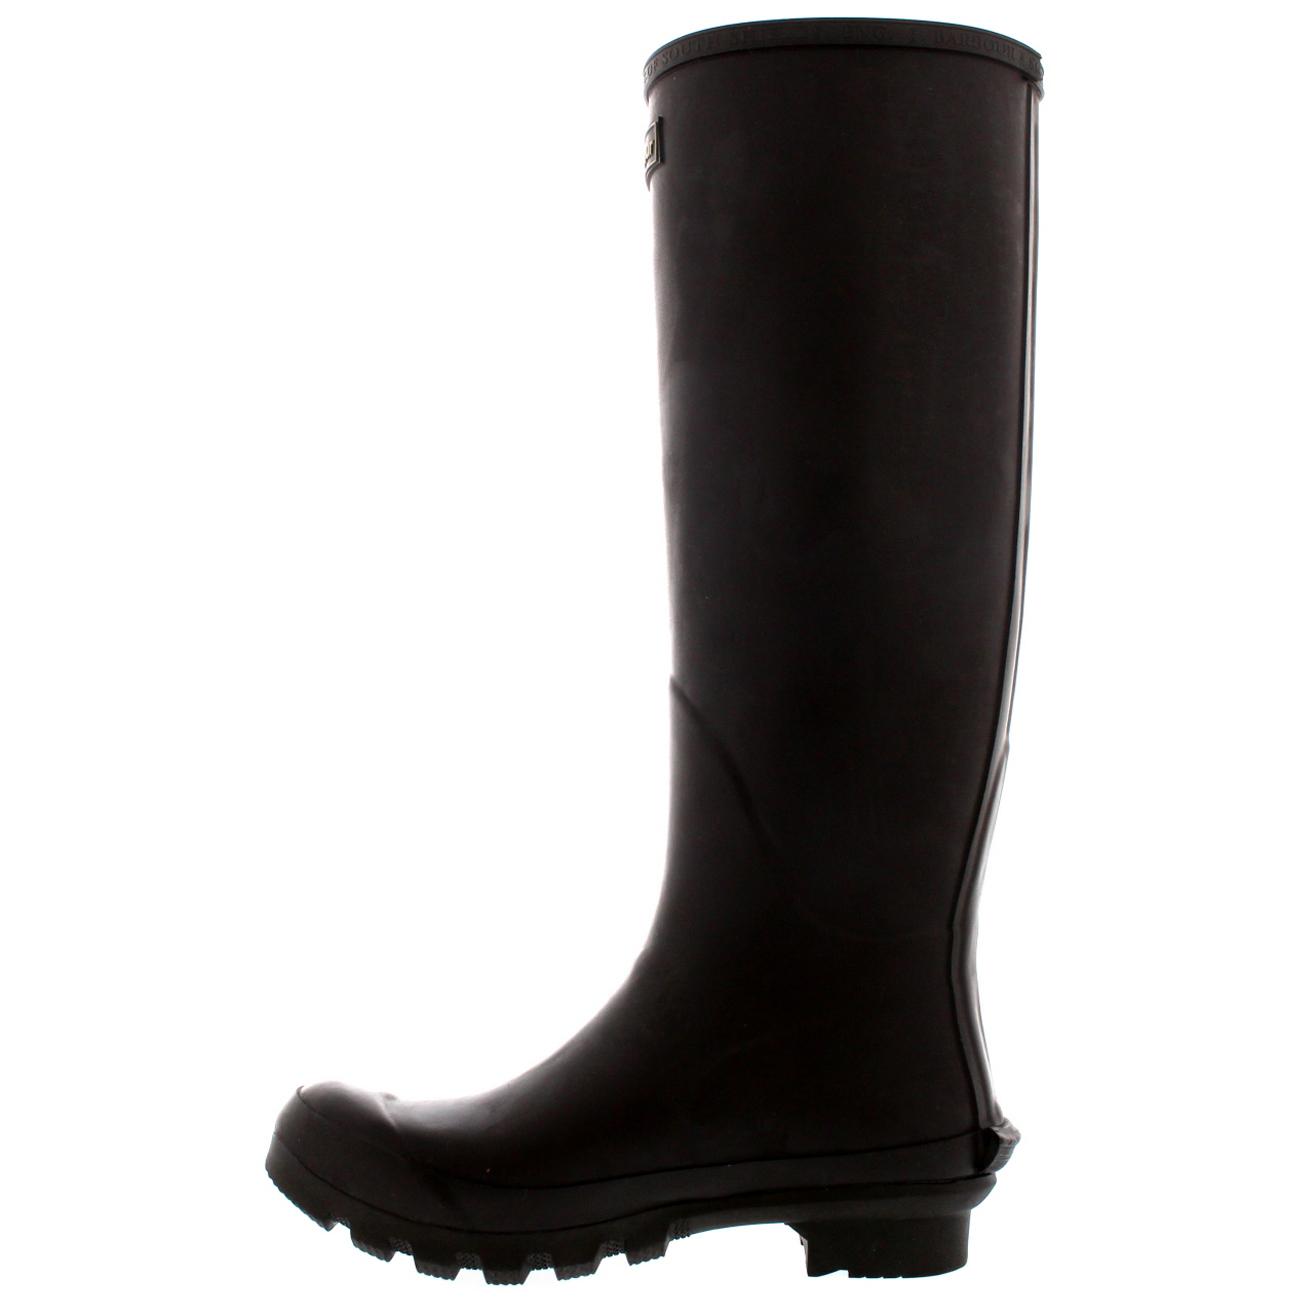 Womens-Barbour-Bede-Snow-Waterproof-Winter-Wellingtons-Mid-Calf-Boots-US-5-11 thumbnail 15